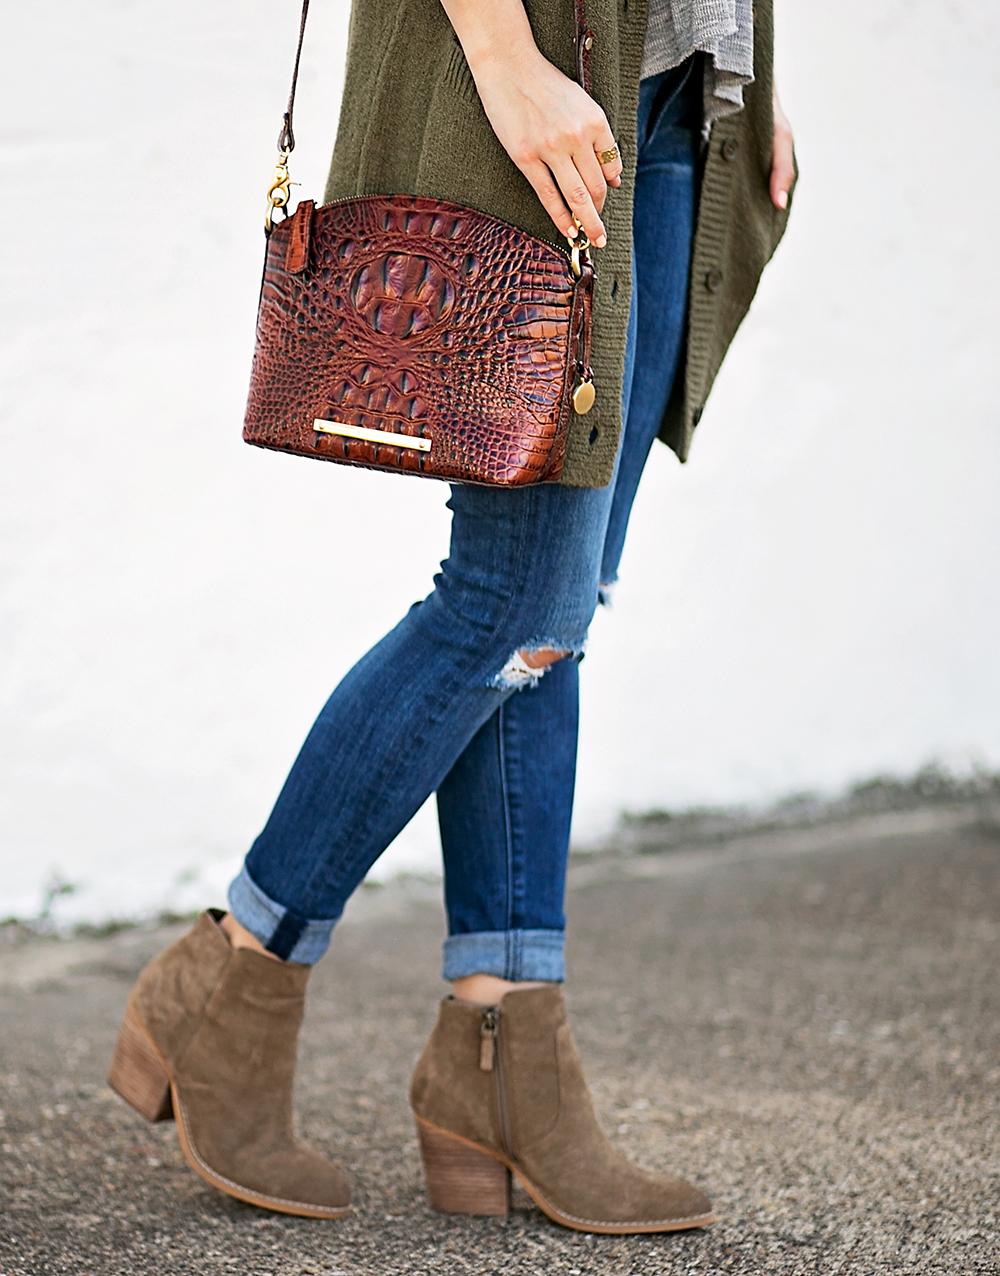 livvyland-blog-olivia-watson-peplum-thermal-tee-shirt-olive-cardigan-boho-outfit-casual-taupe-ankle-booties-fall-outfit-idea-celine-baby-marta-sunglasses-brahmin-mini-duxbury-handbag